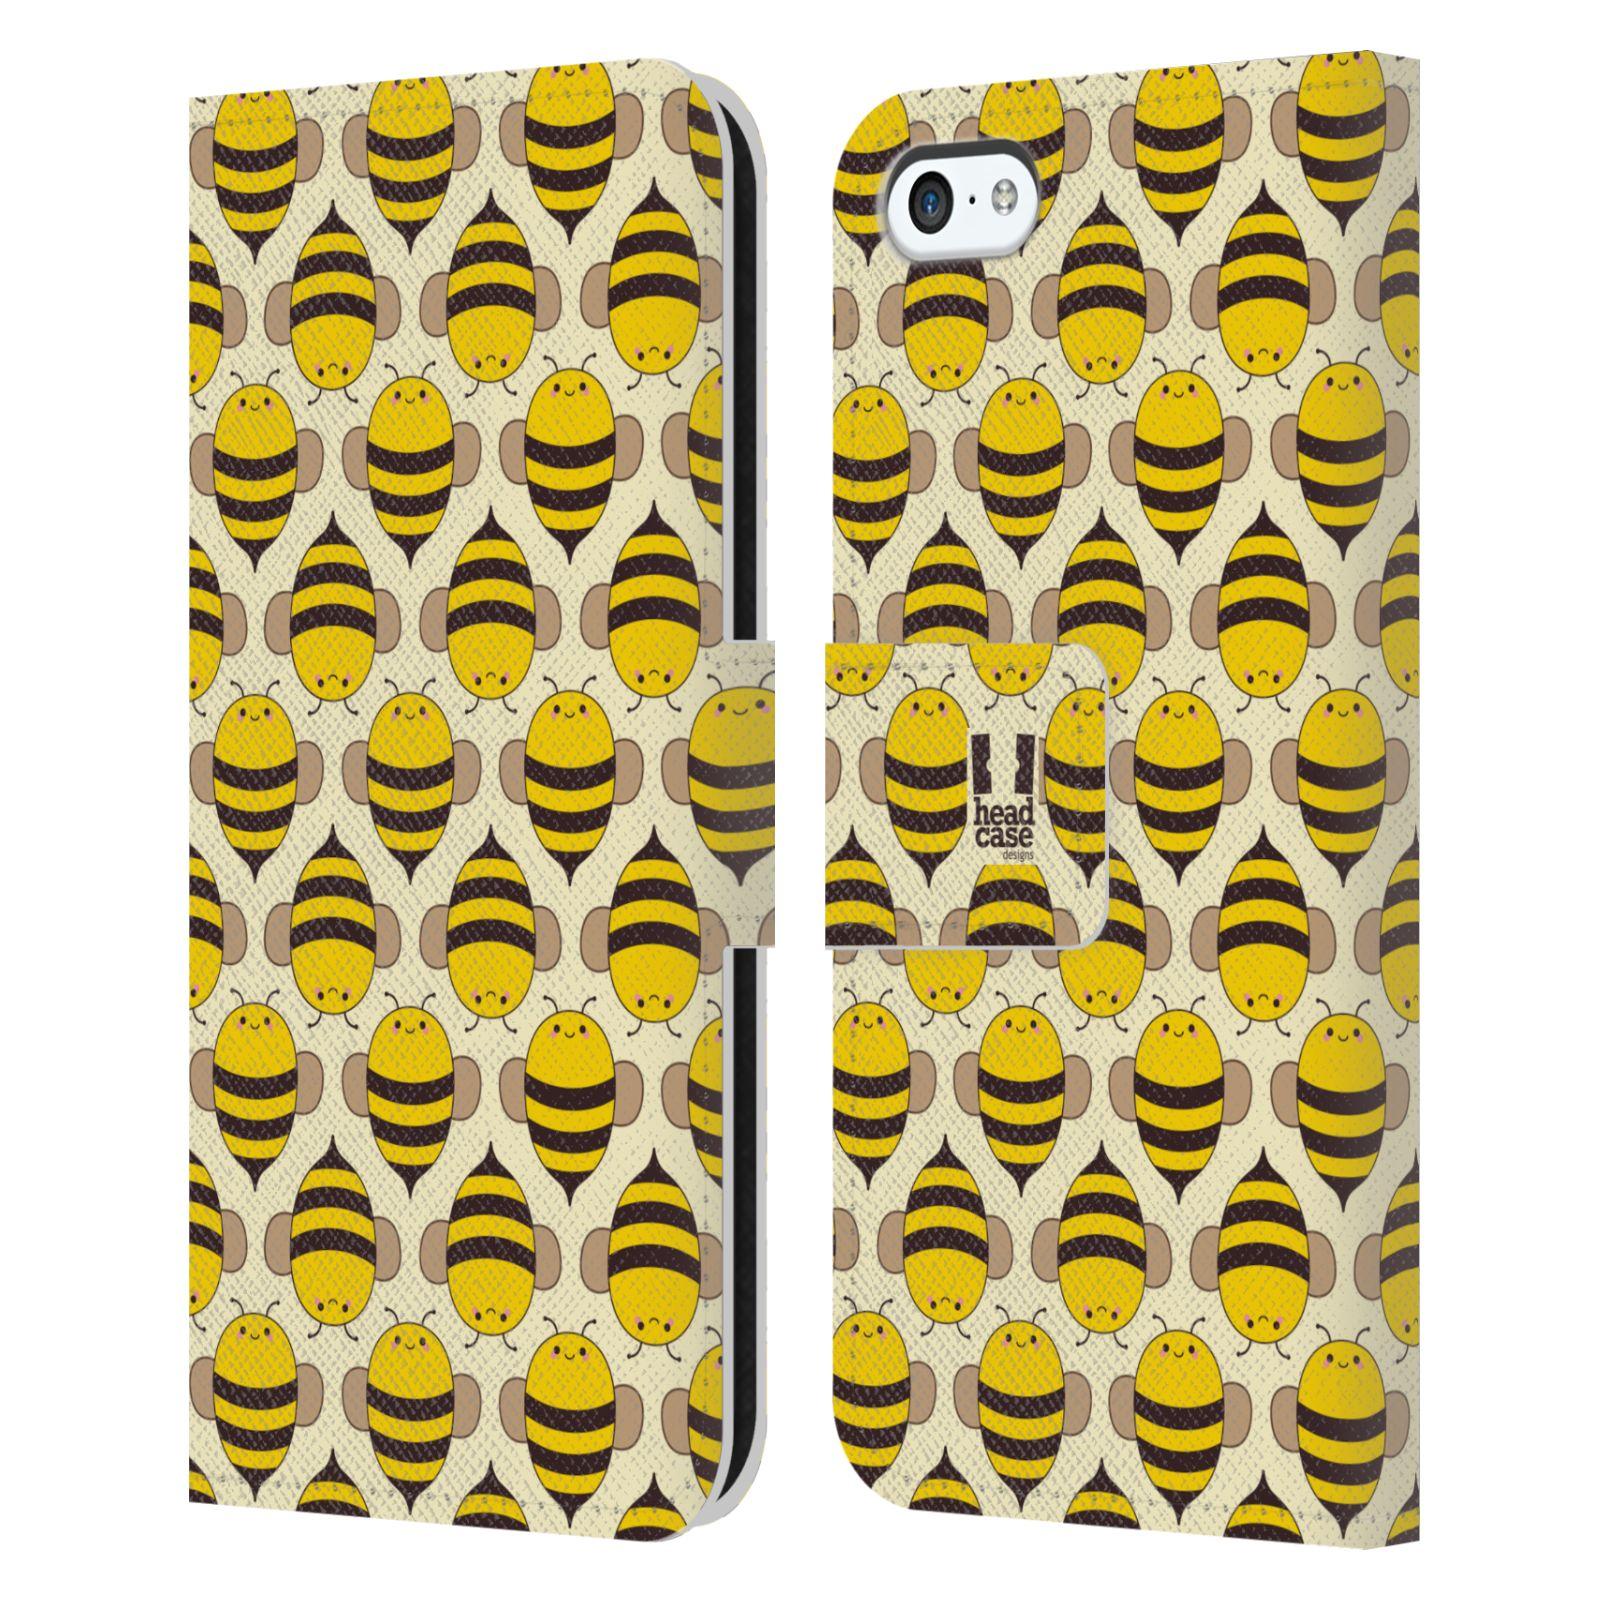 HEAD CASE Flipové pouzdro pro mobil Apple Iphone 5C VČELÍ VZOR kolonie včelek